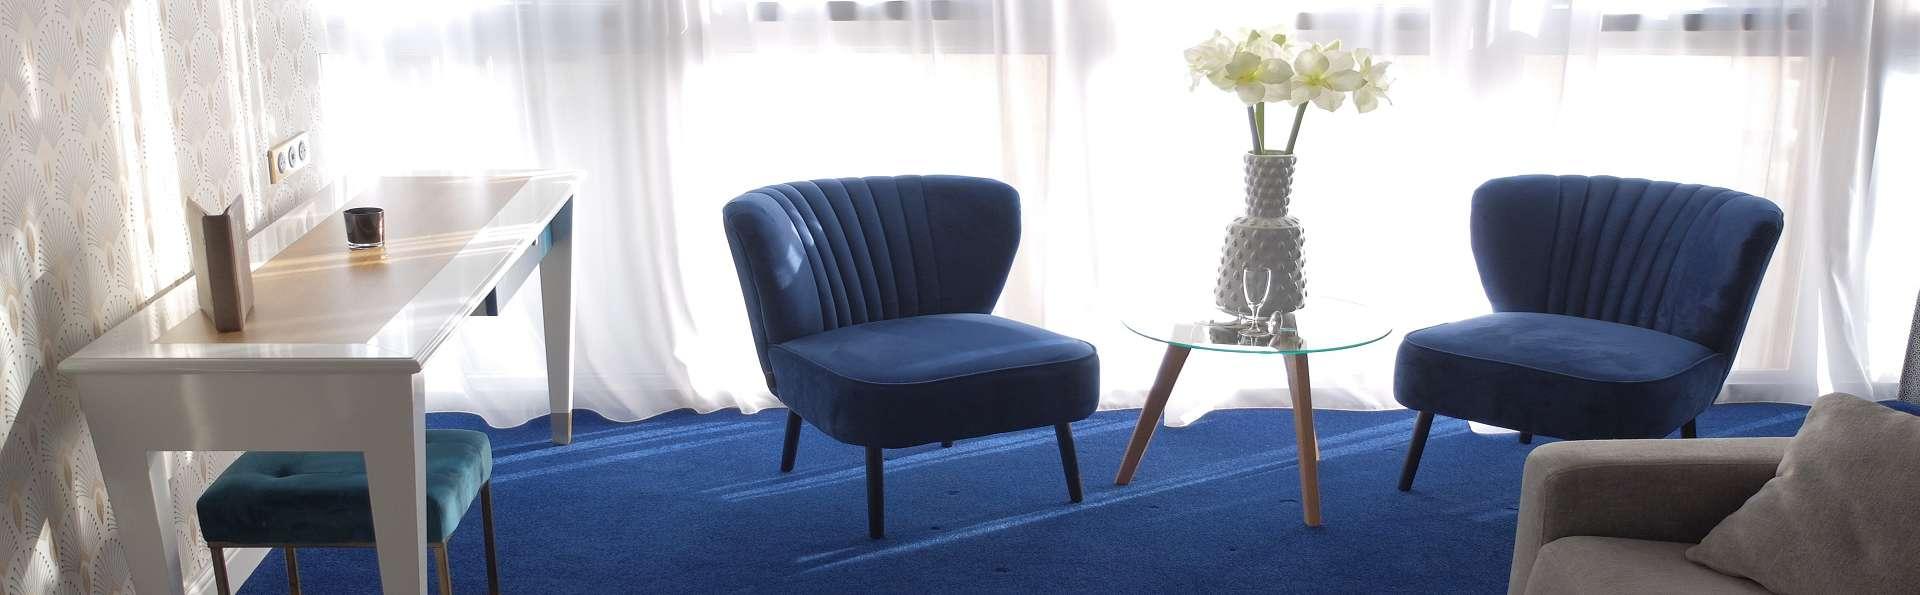 Splendid hôtel & Spa - EDIT_NEW_DELUXE_ROOM_3.jpg